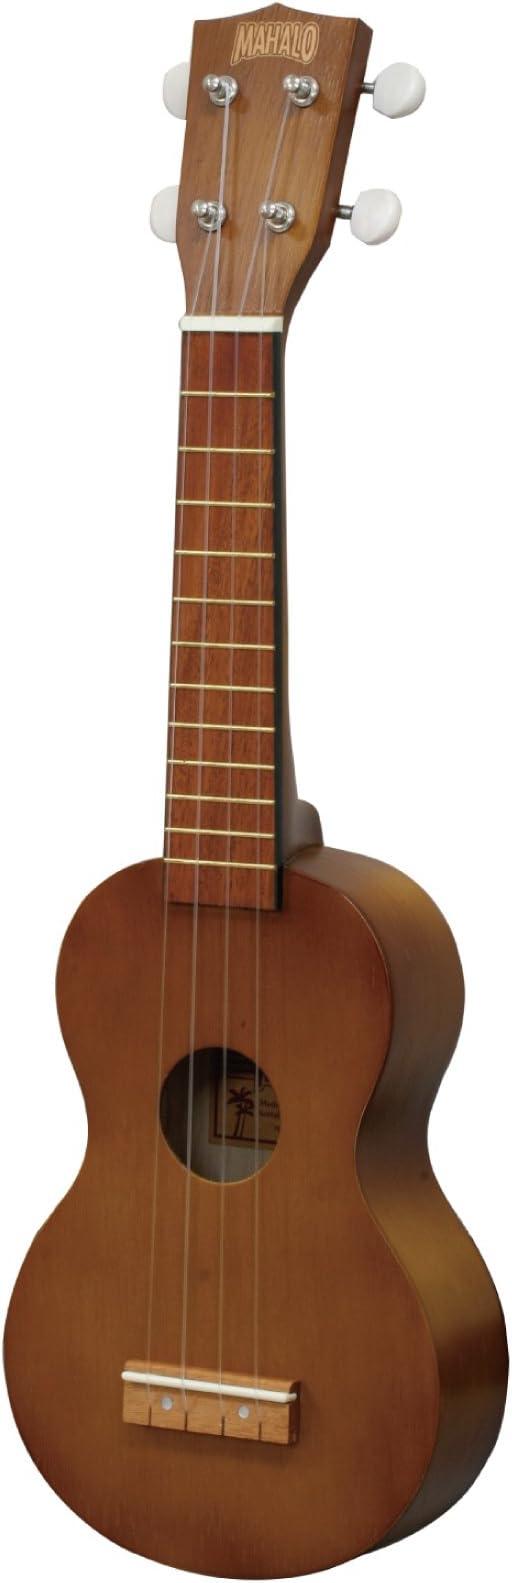 Mahalo MK1/TBR - Ukelele: Amazon.es: Instrumentos musicales